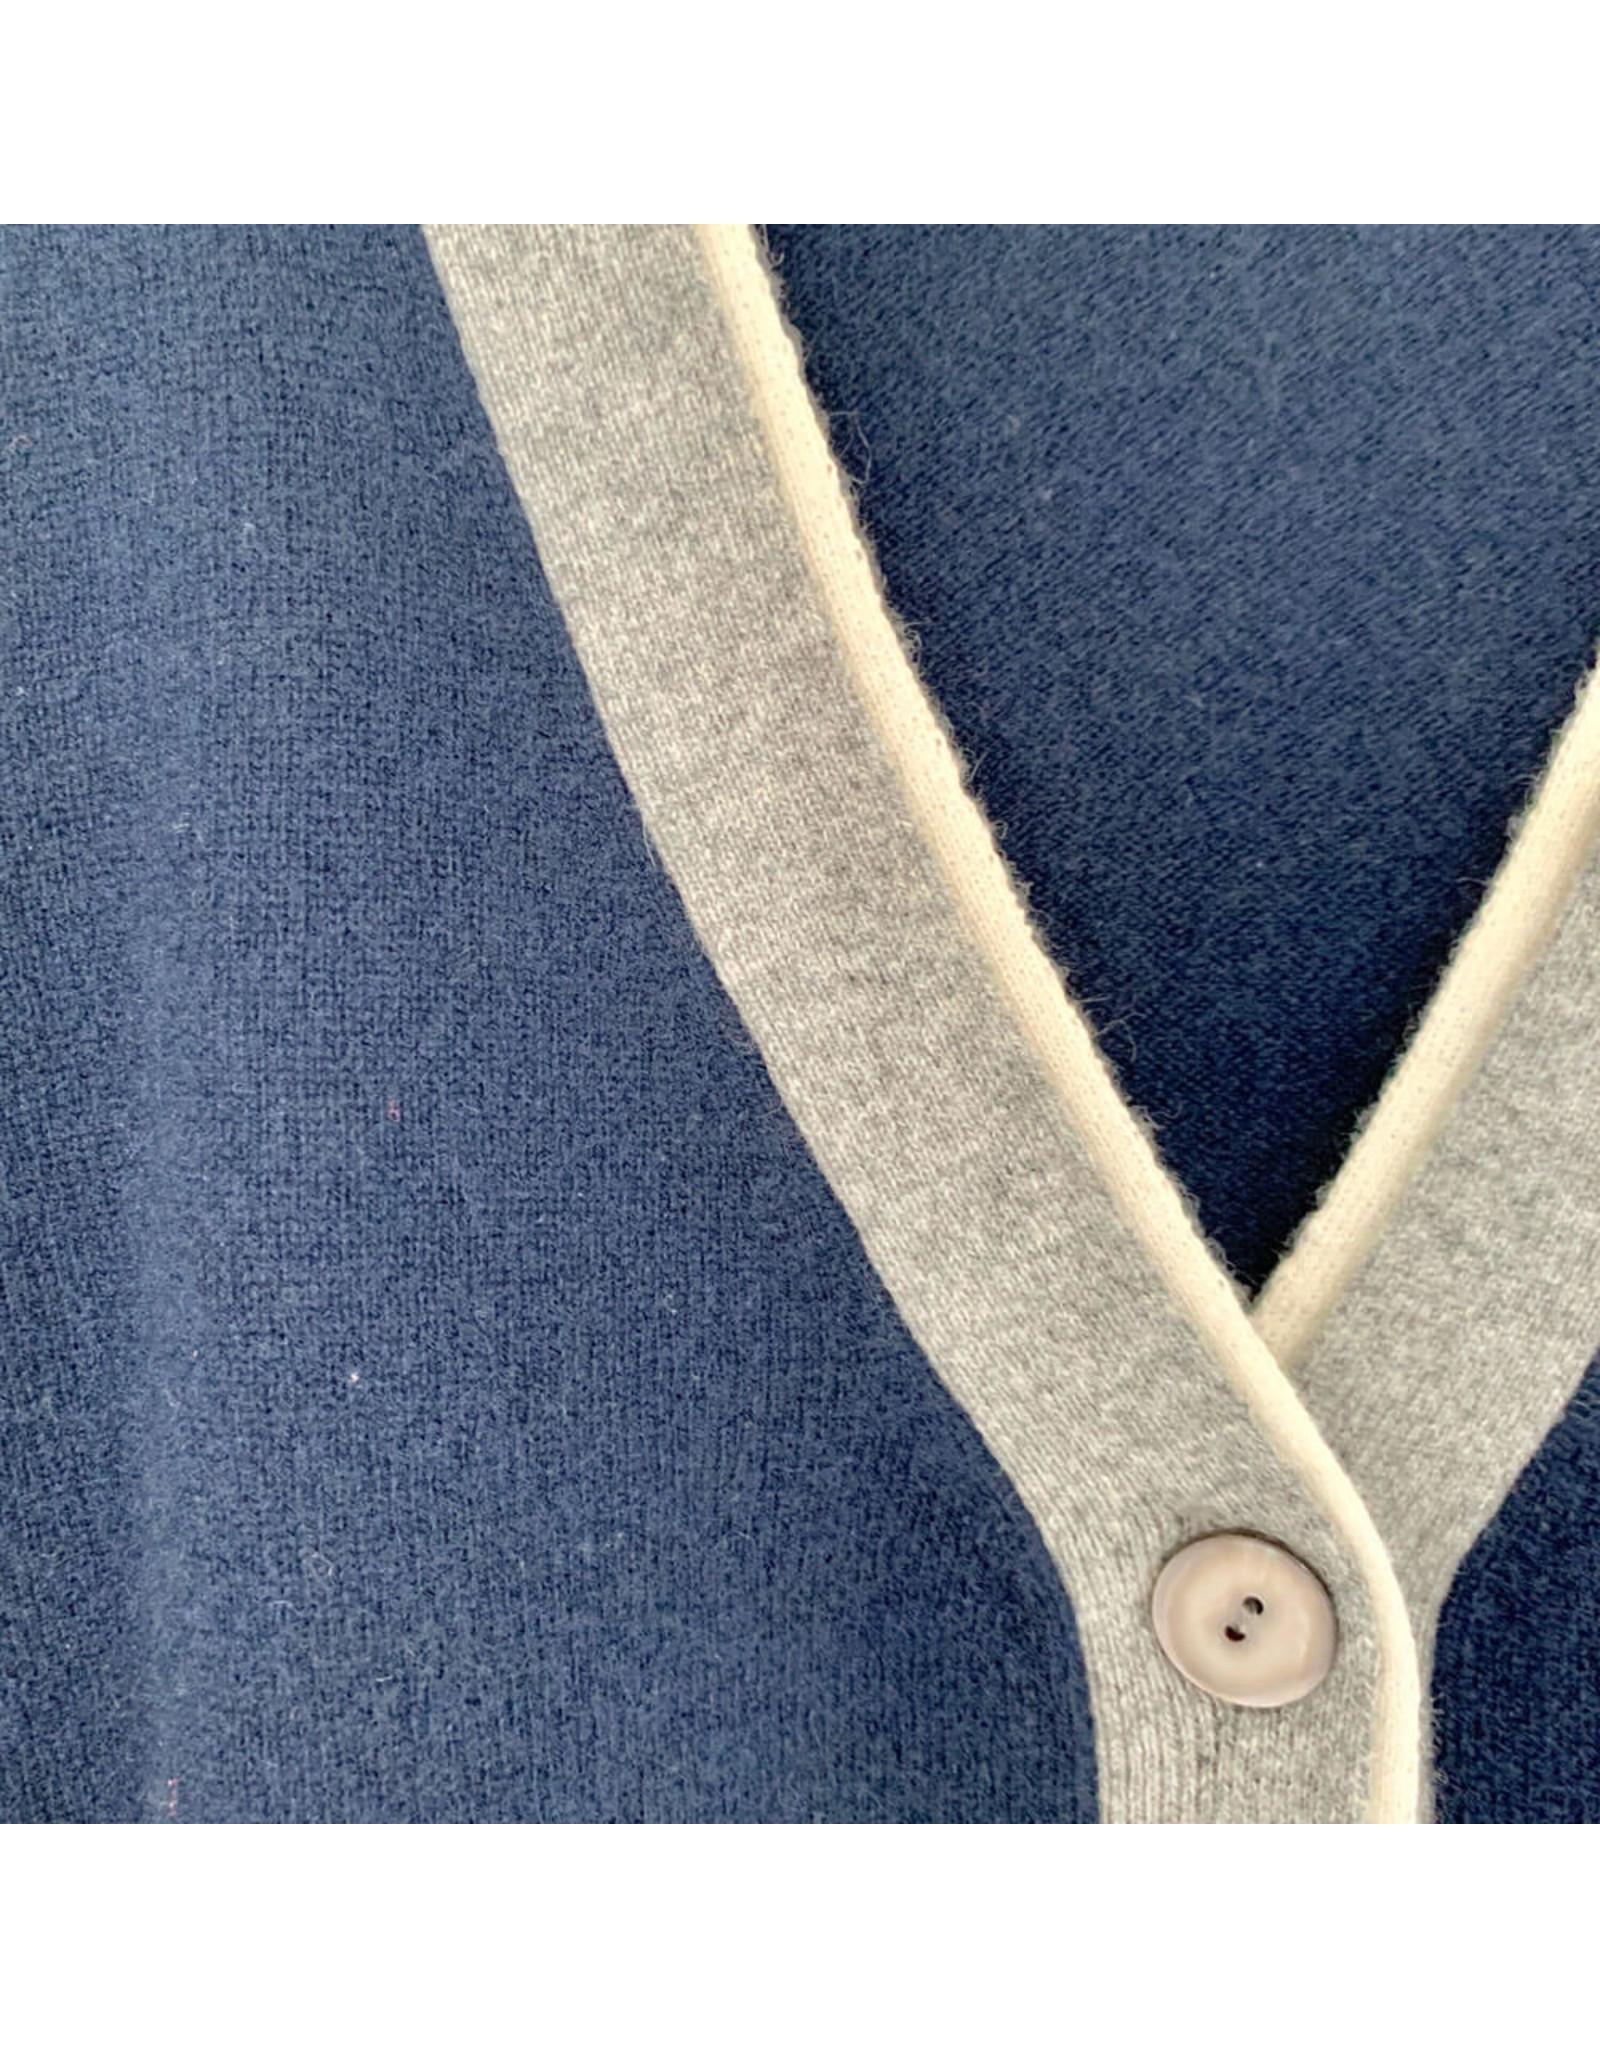 jumper 1234 small double rib cardigan